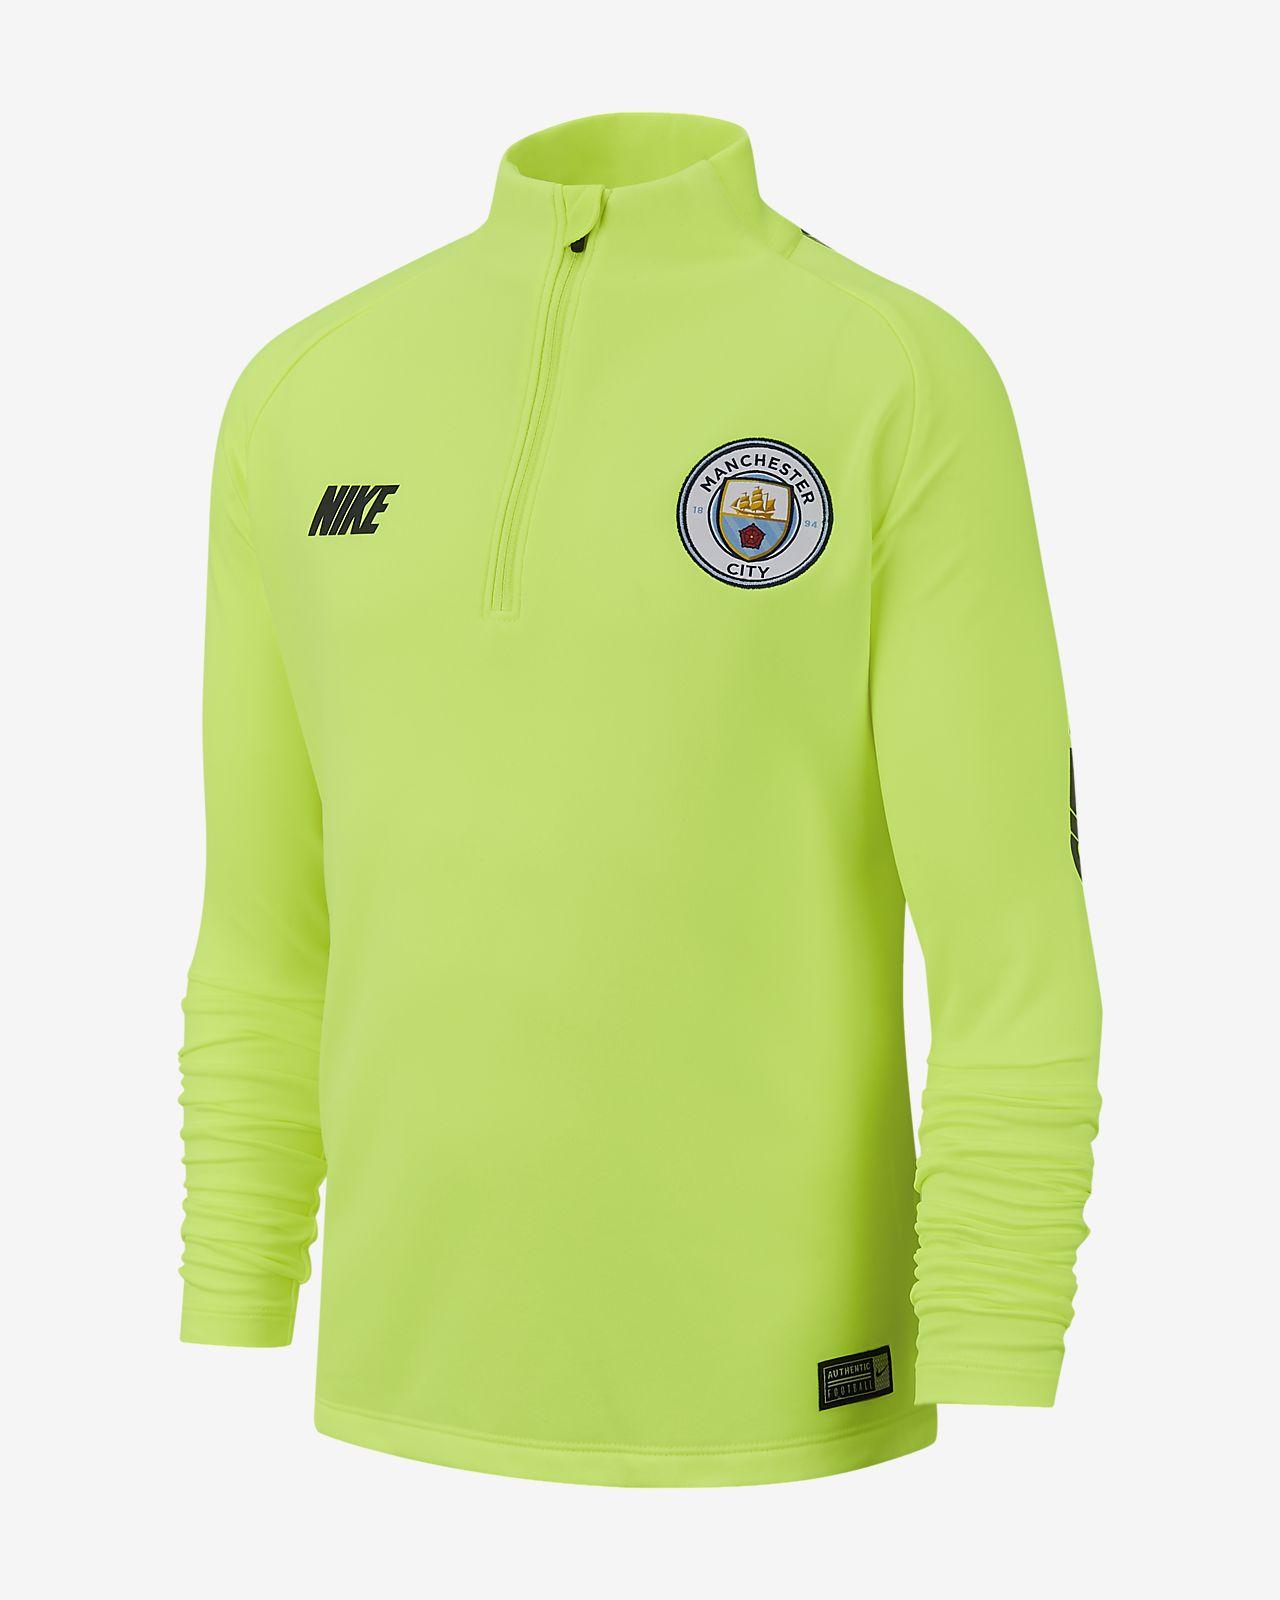 Manchester City FC Dri-FIT Squad Drill Voetbaltop met lange mouwen voor kids